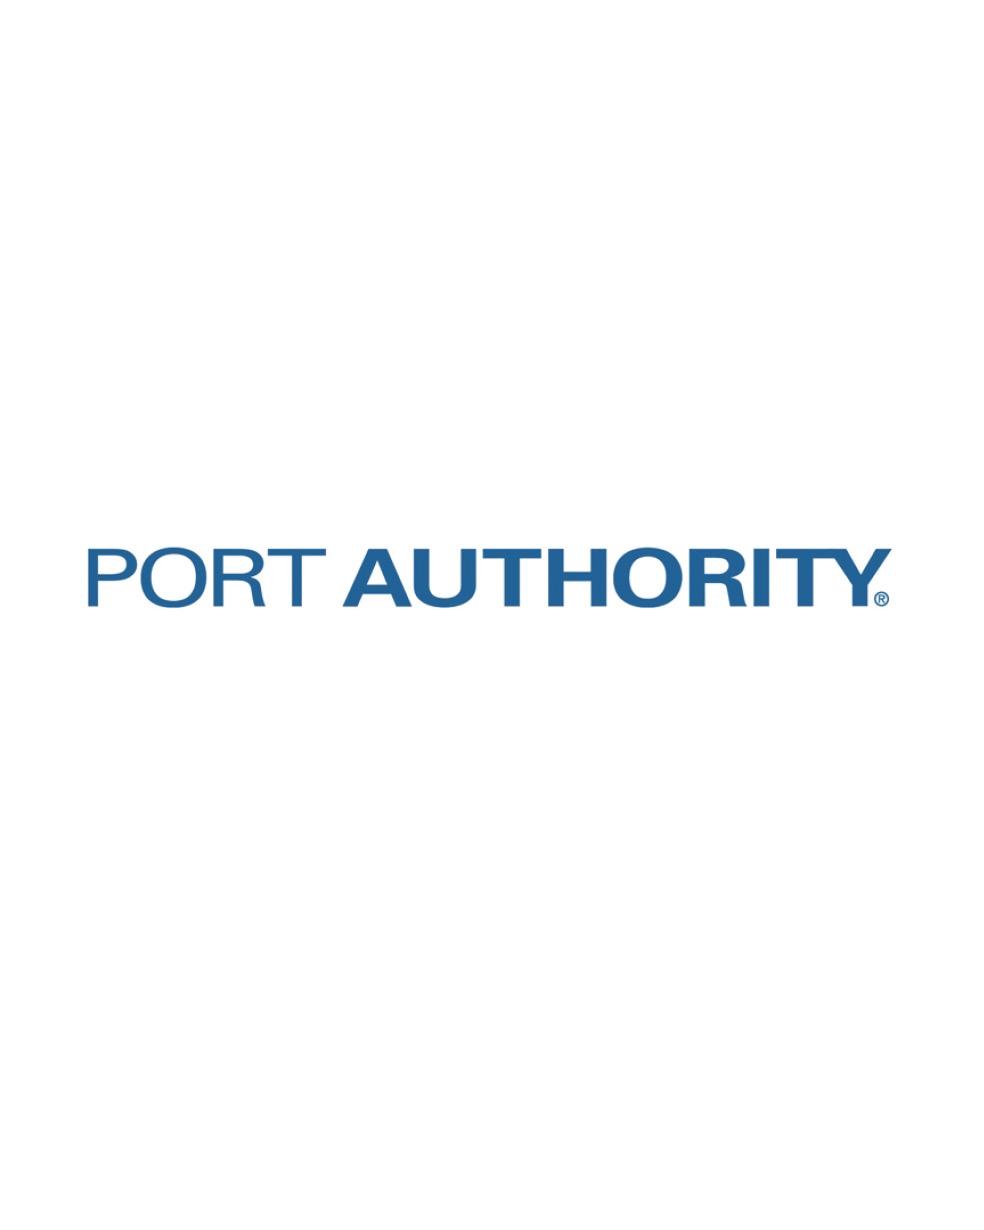 Promo Logos - Port Authority.jpg